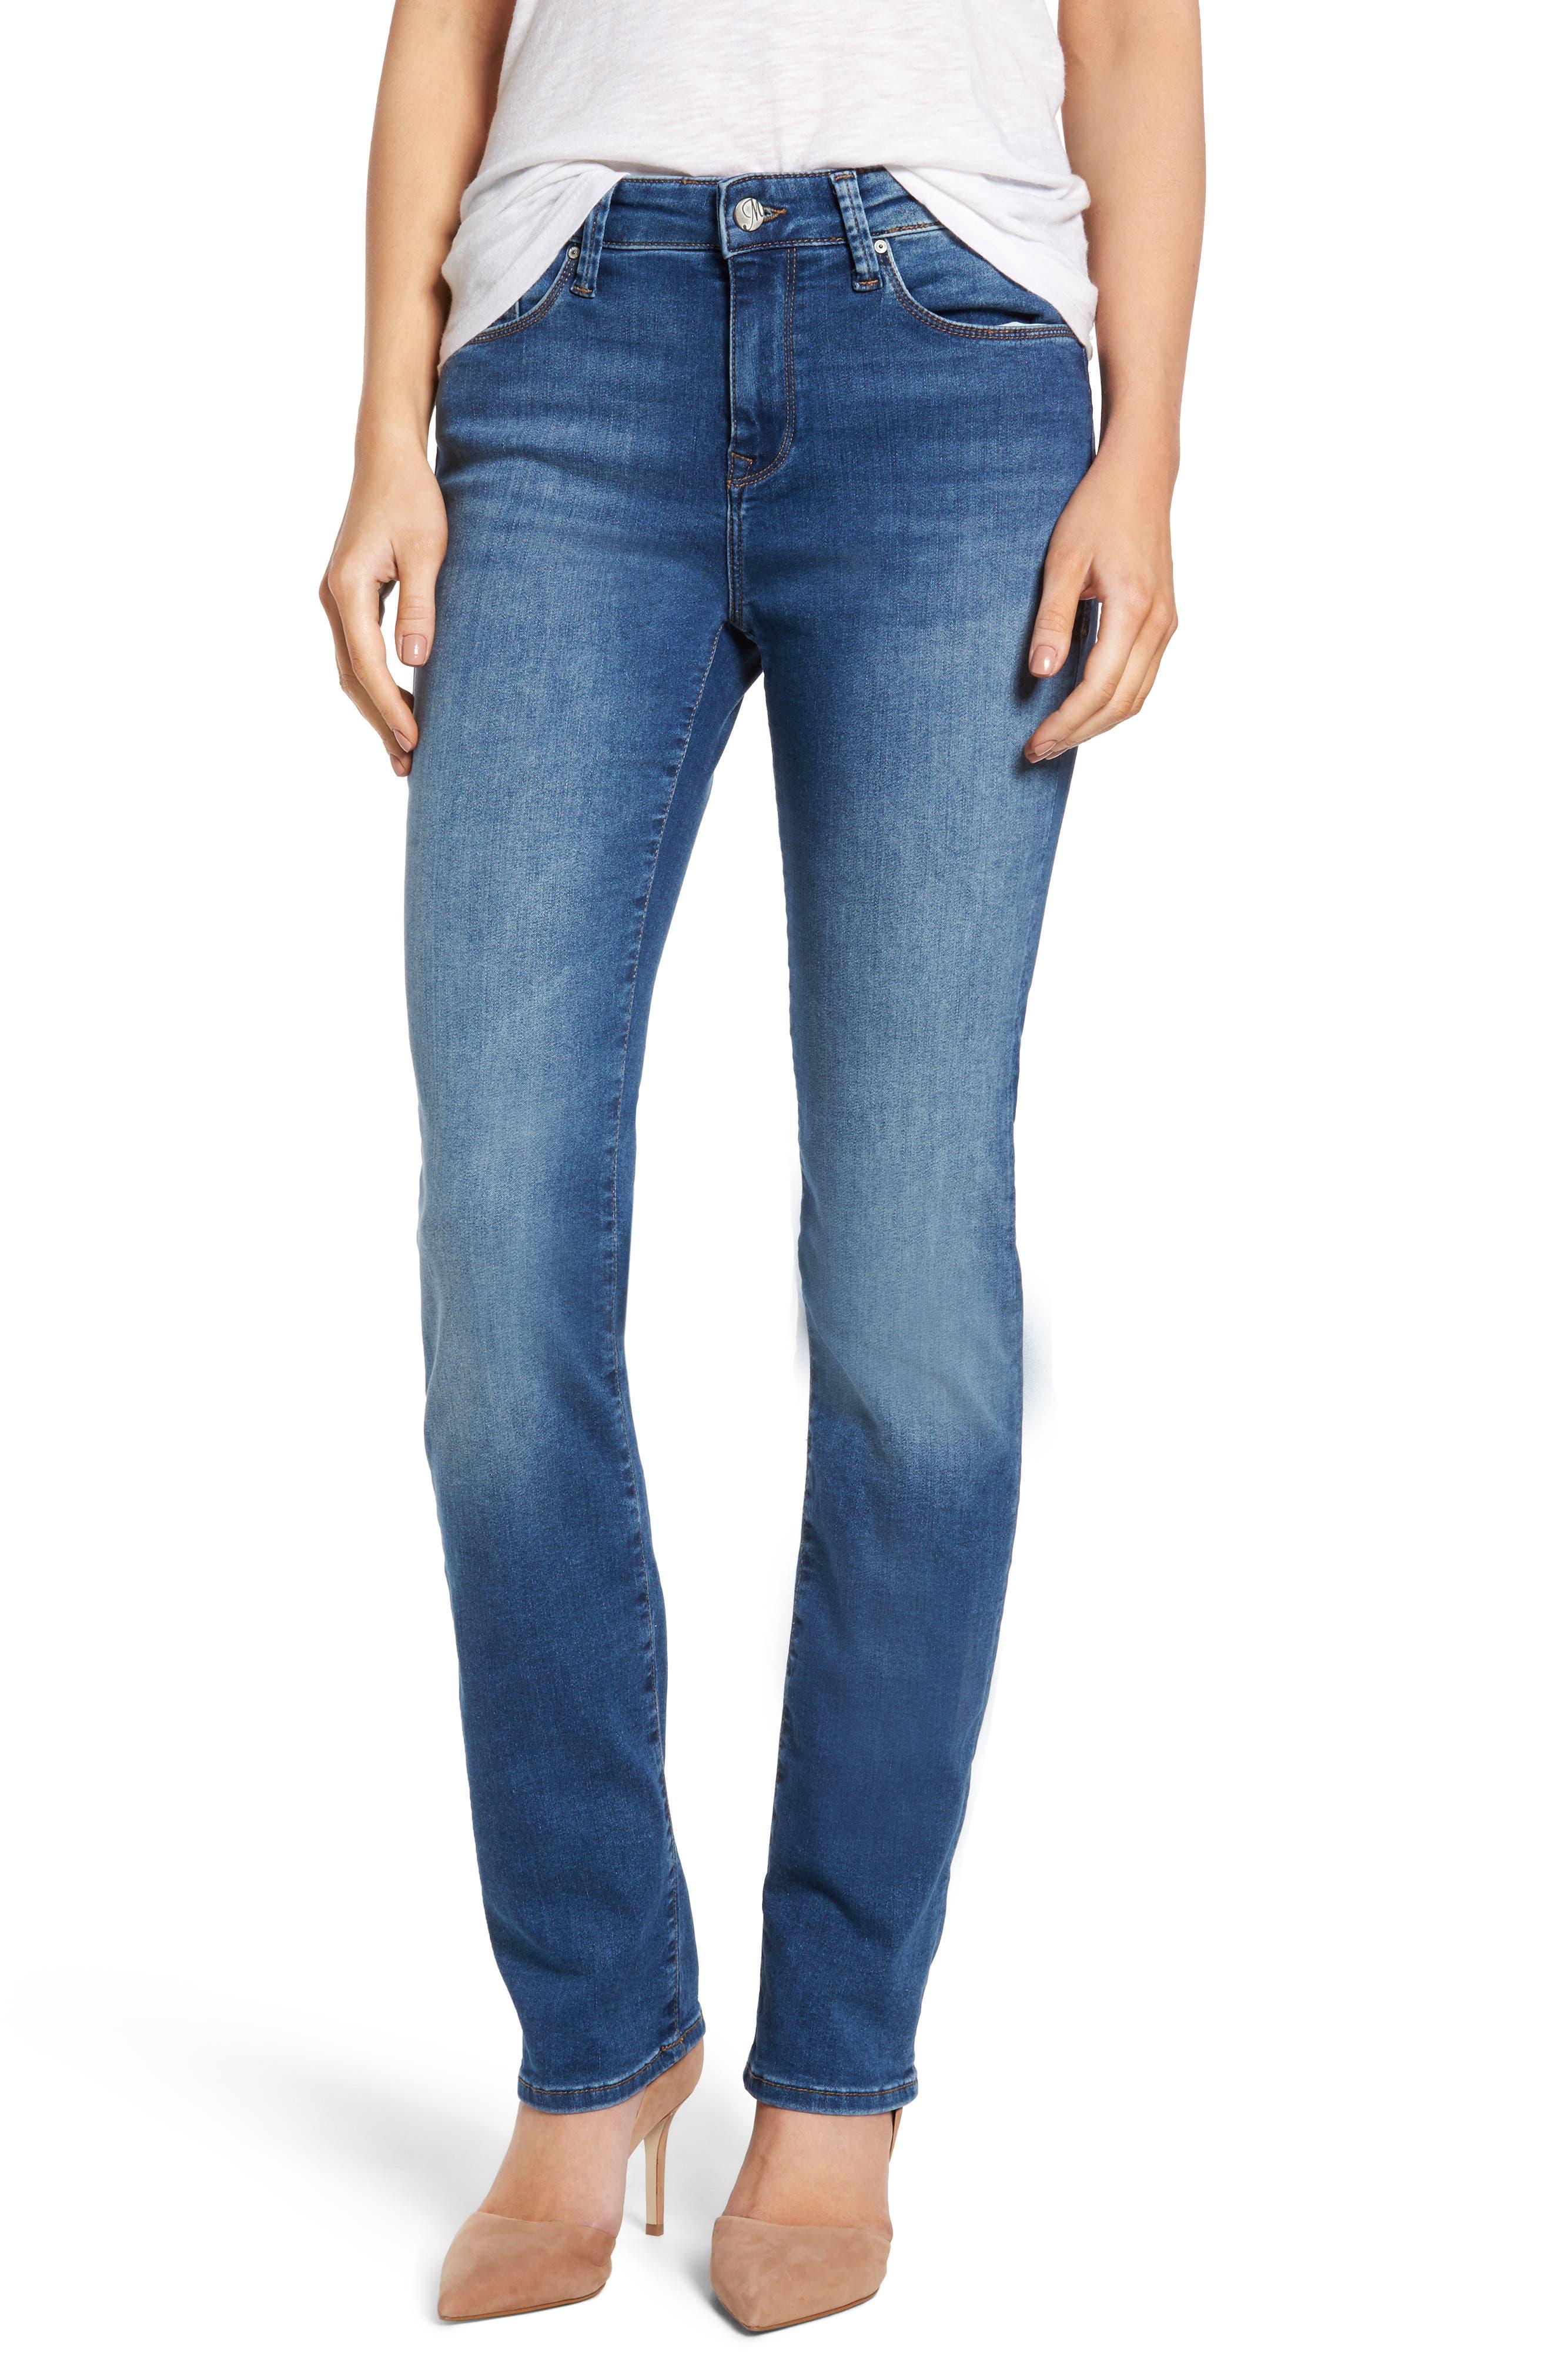 Kendra High Waist Stretch Denim Jeans,                             Main thumbnail 1, color,                             650